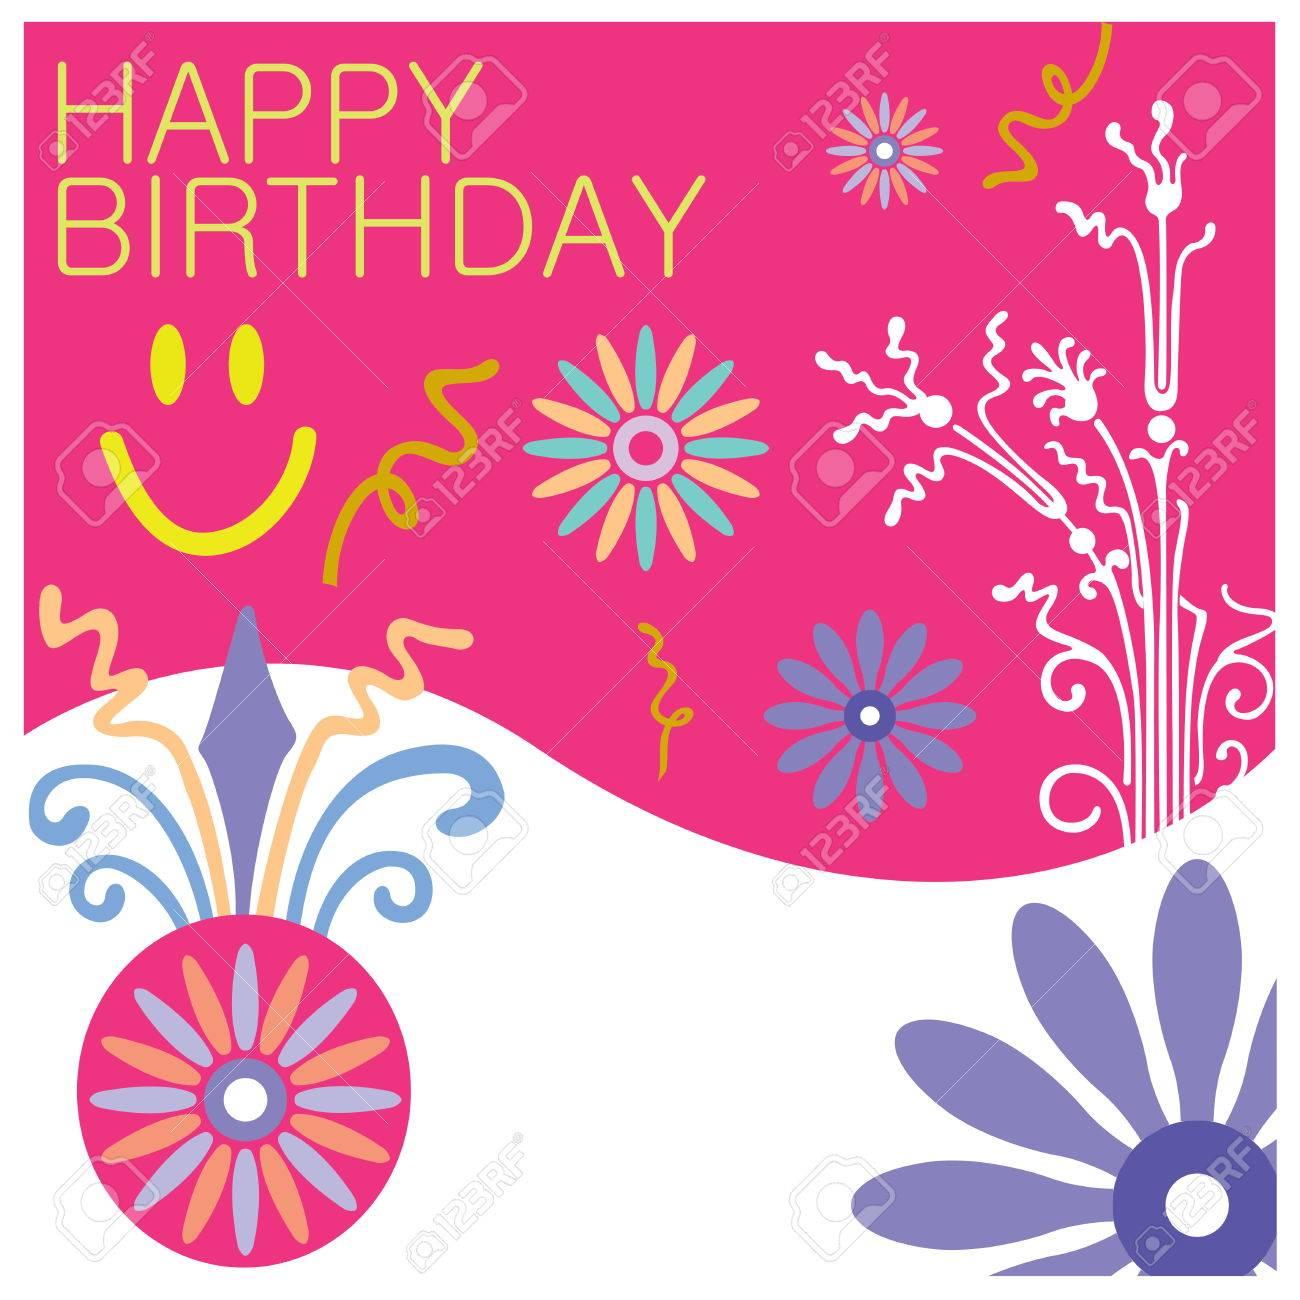 Birthday Greeting Card Design Royalty Free Cliparts Vectors And – Birthday Greeting Designs